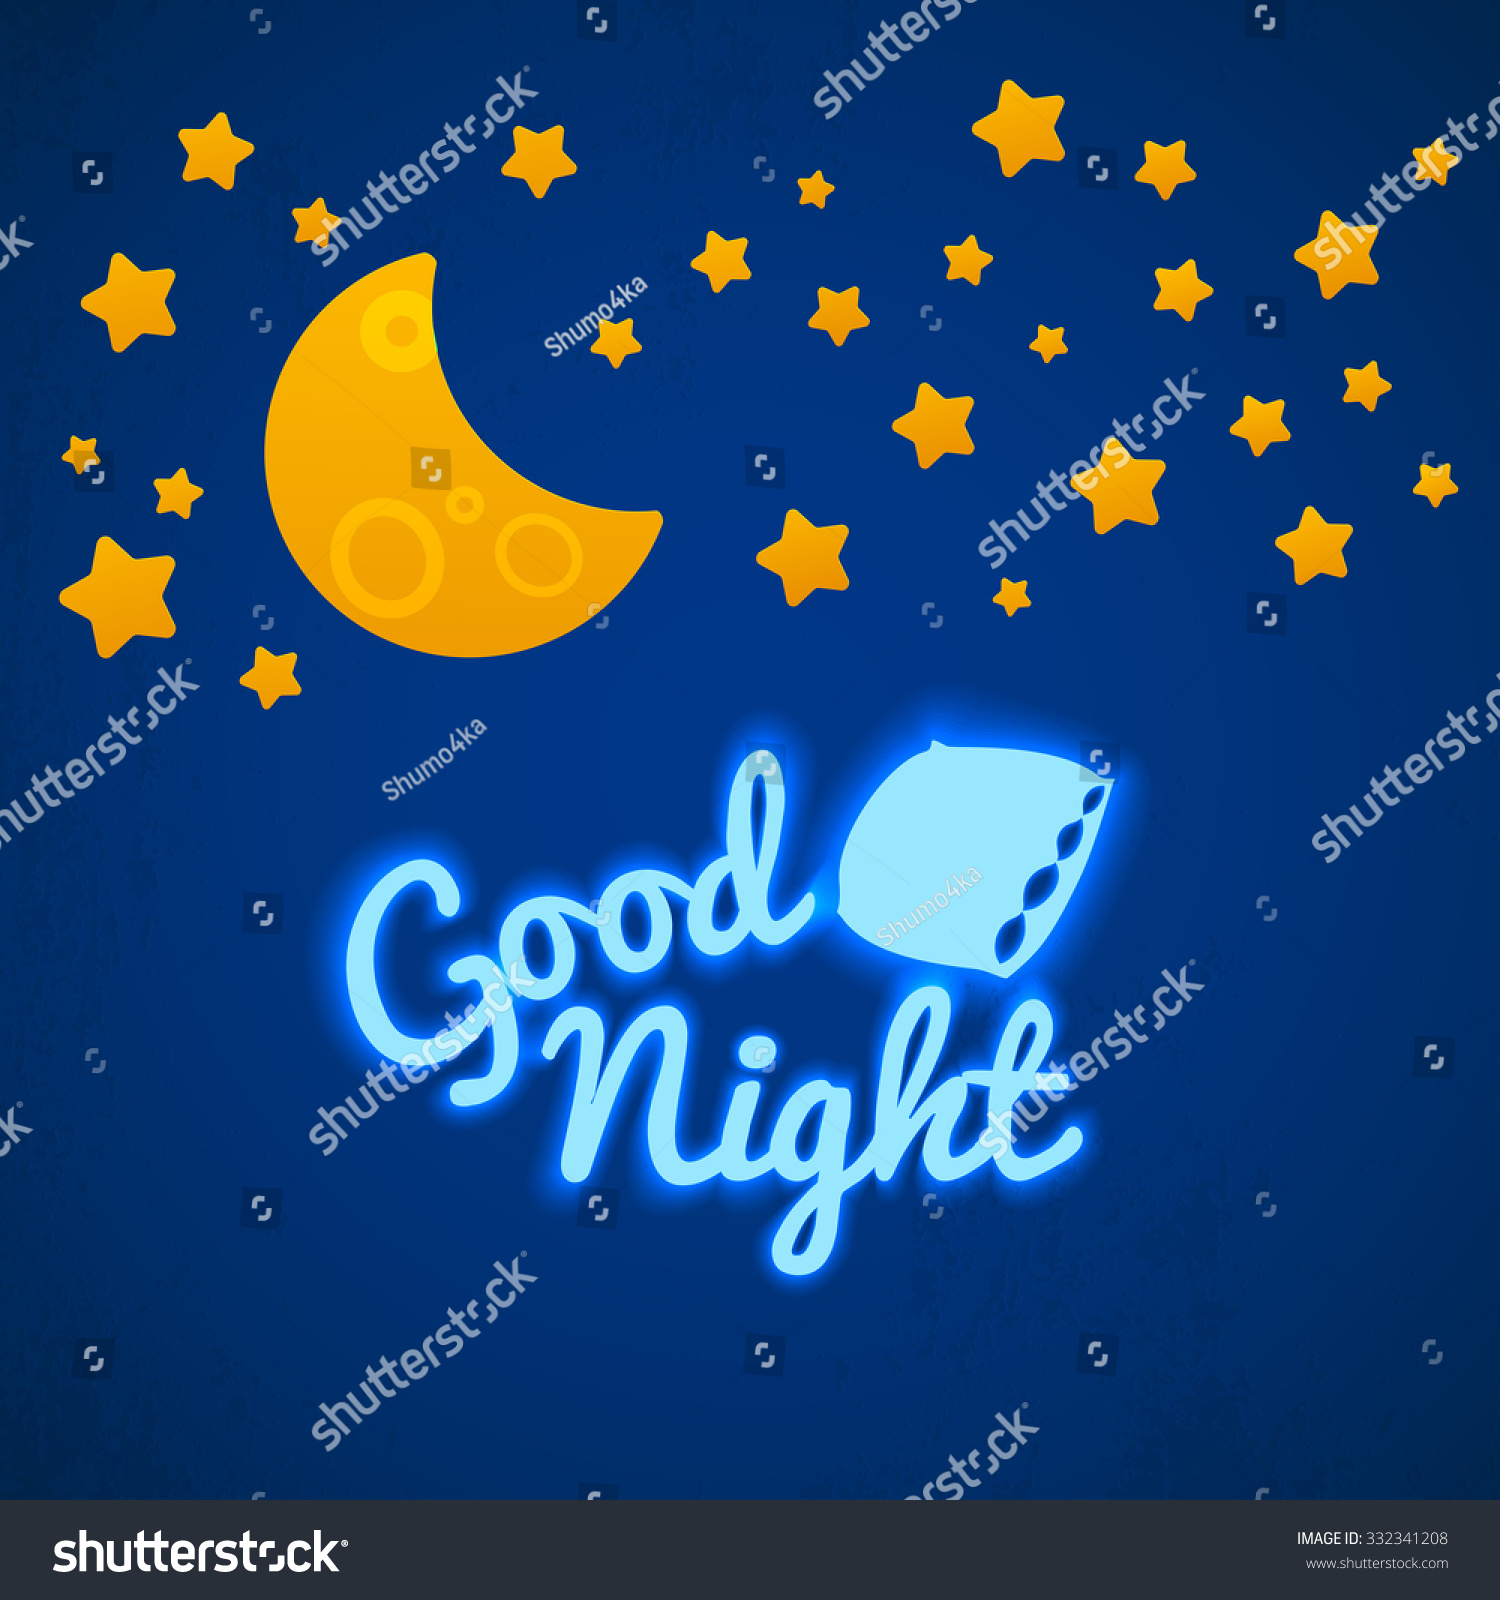 Good Night Bed Time Illustration Children Stock Vector